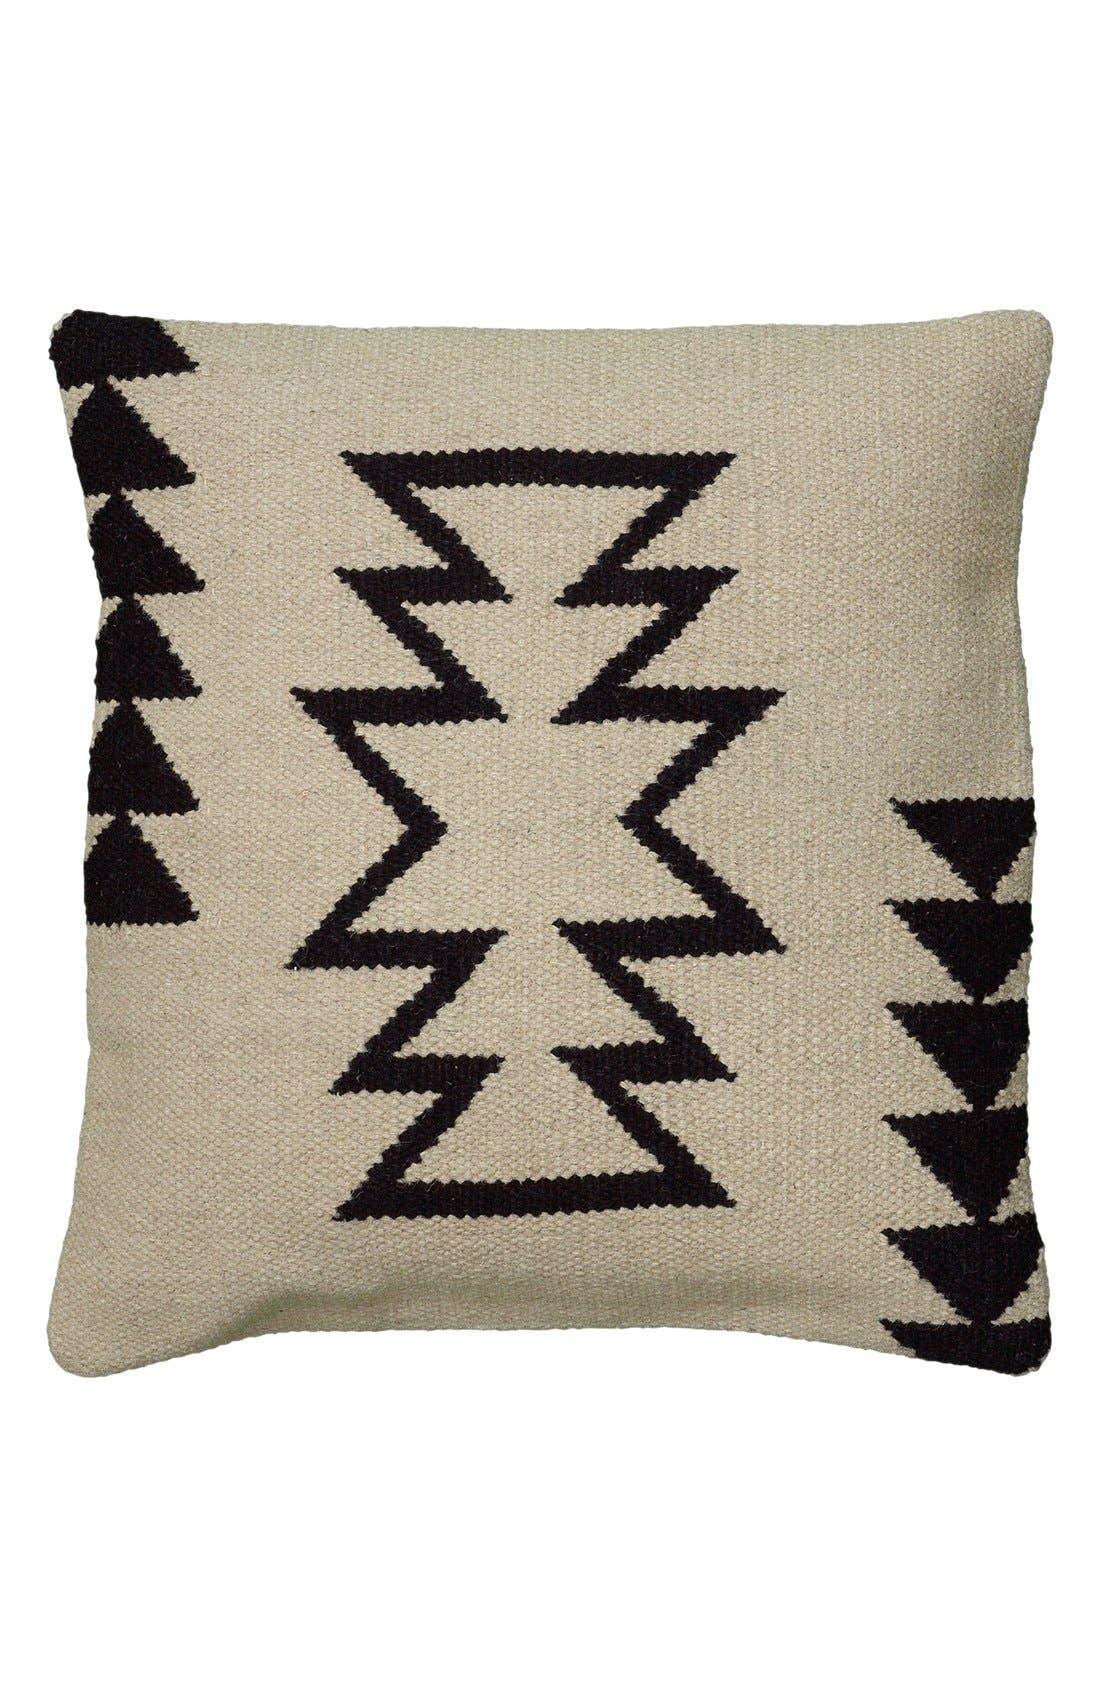 Rizzy Home 'Phoenix' Pillow